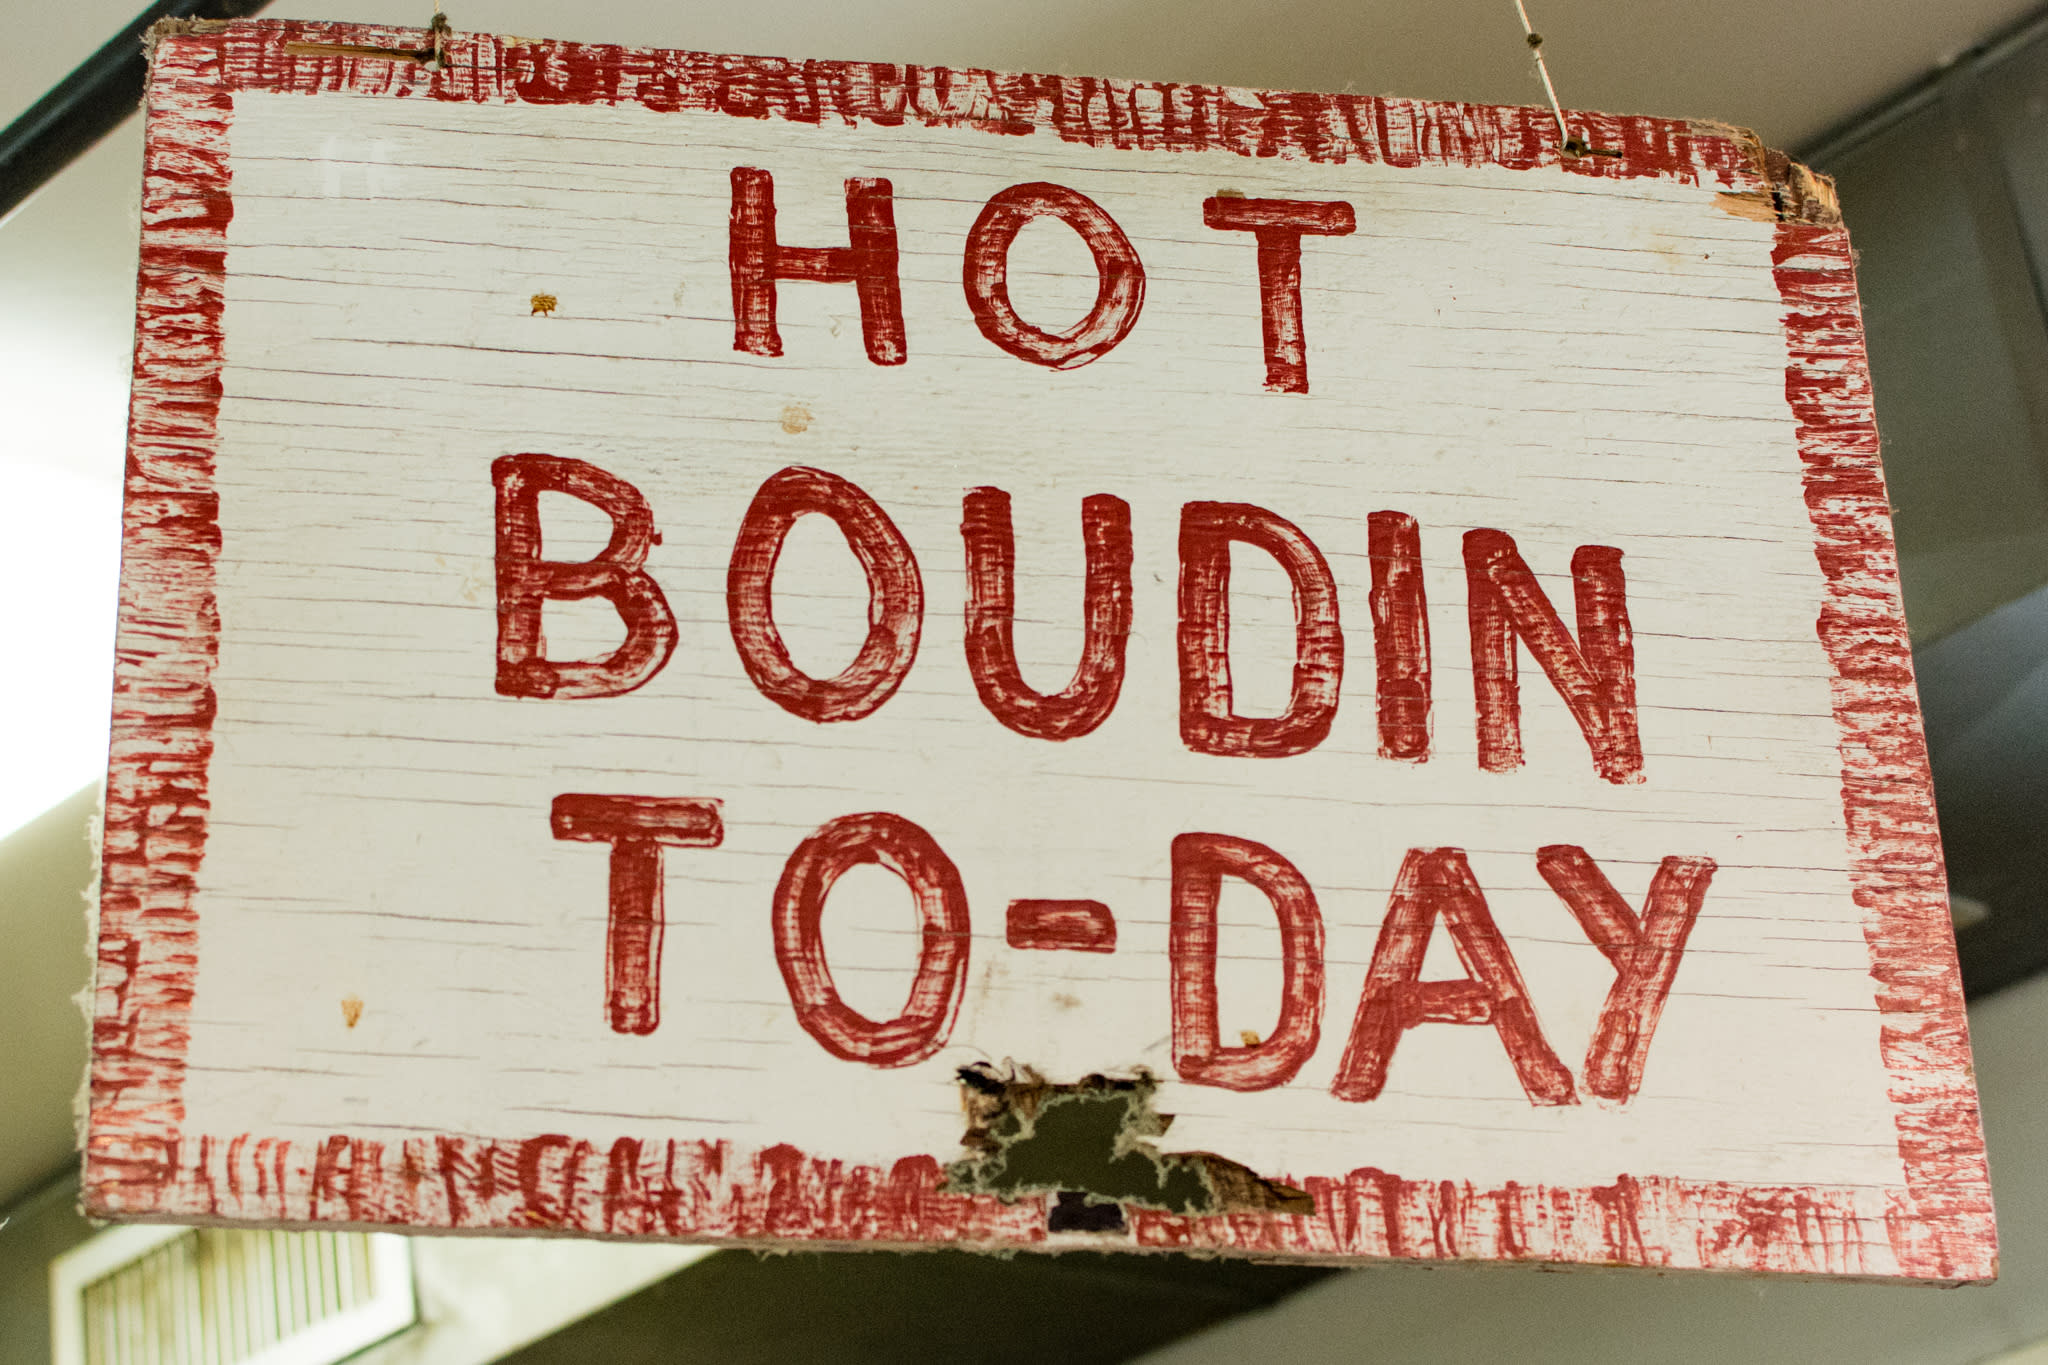 Johnson's Boucaniere Hot Boudin Saign